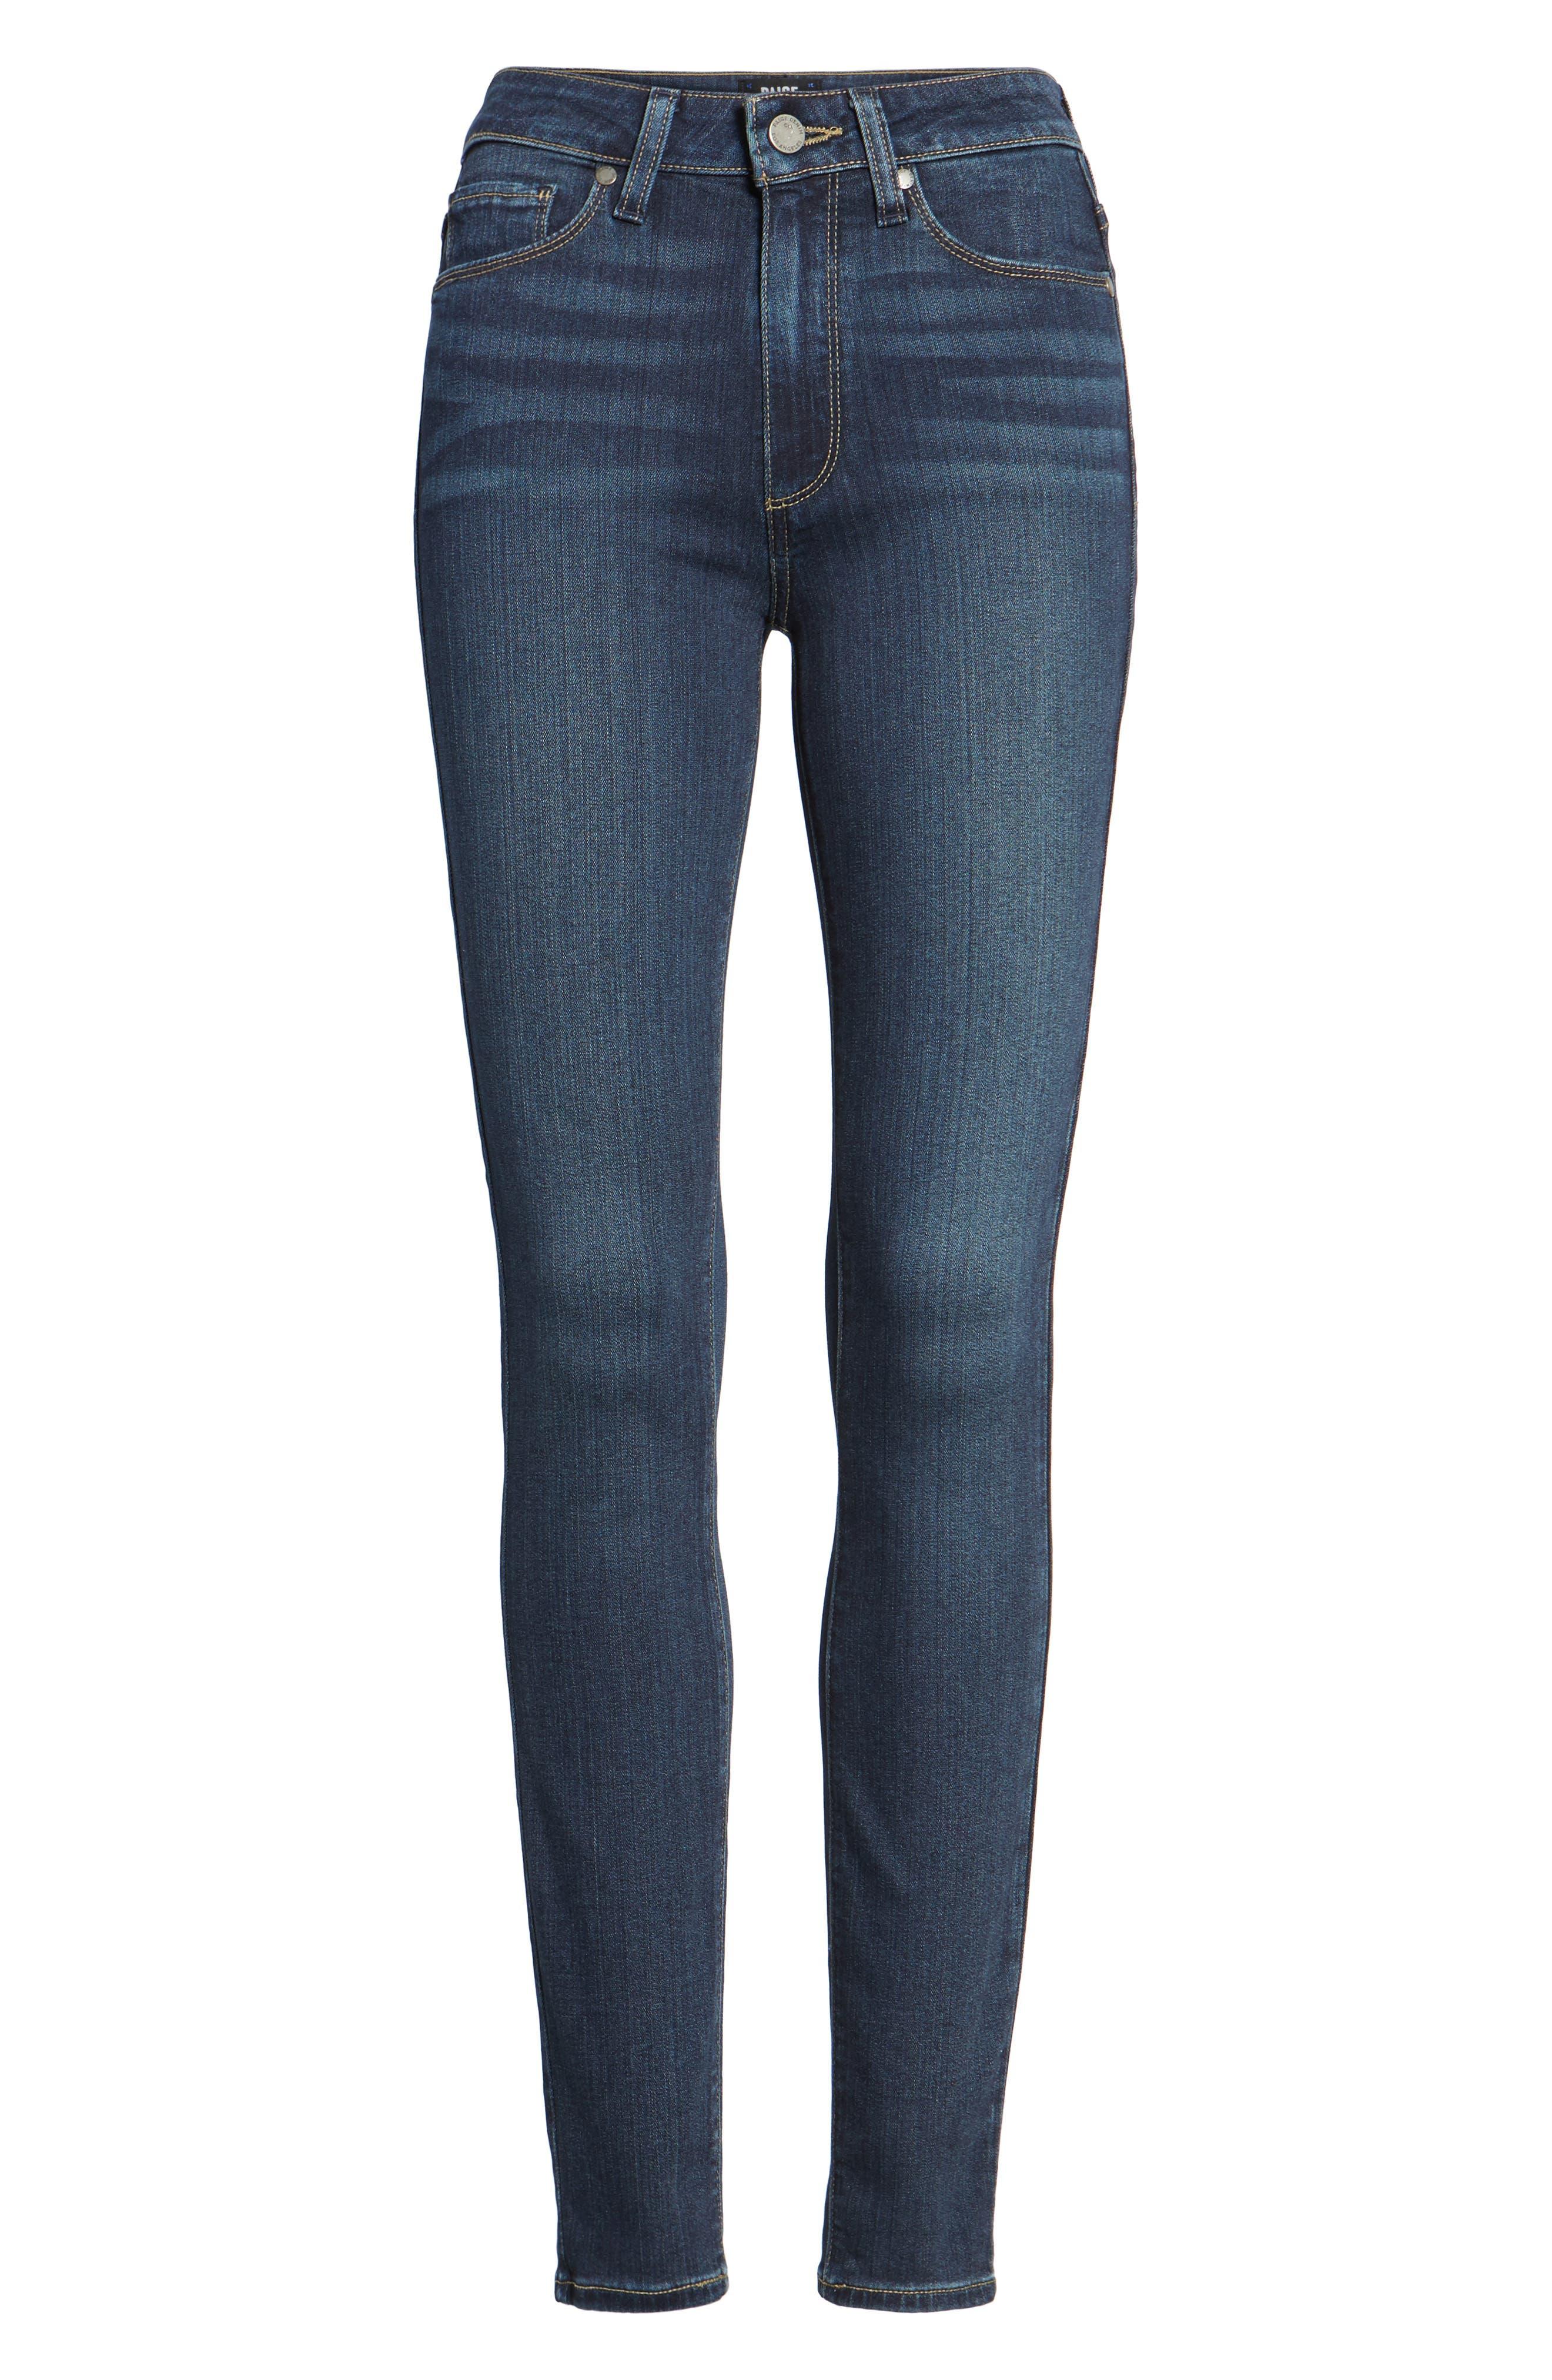 Transcend - Hoxton High Waist Ultra Skinny Jeans,                             Alternate thumbnail 8, color,                             Nottingham